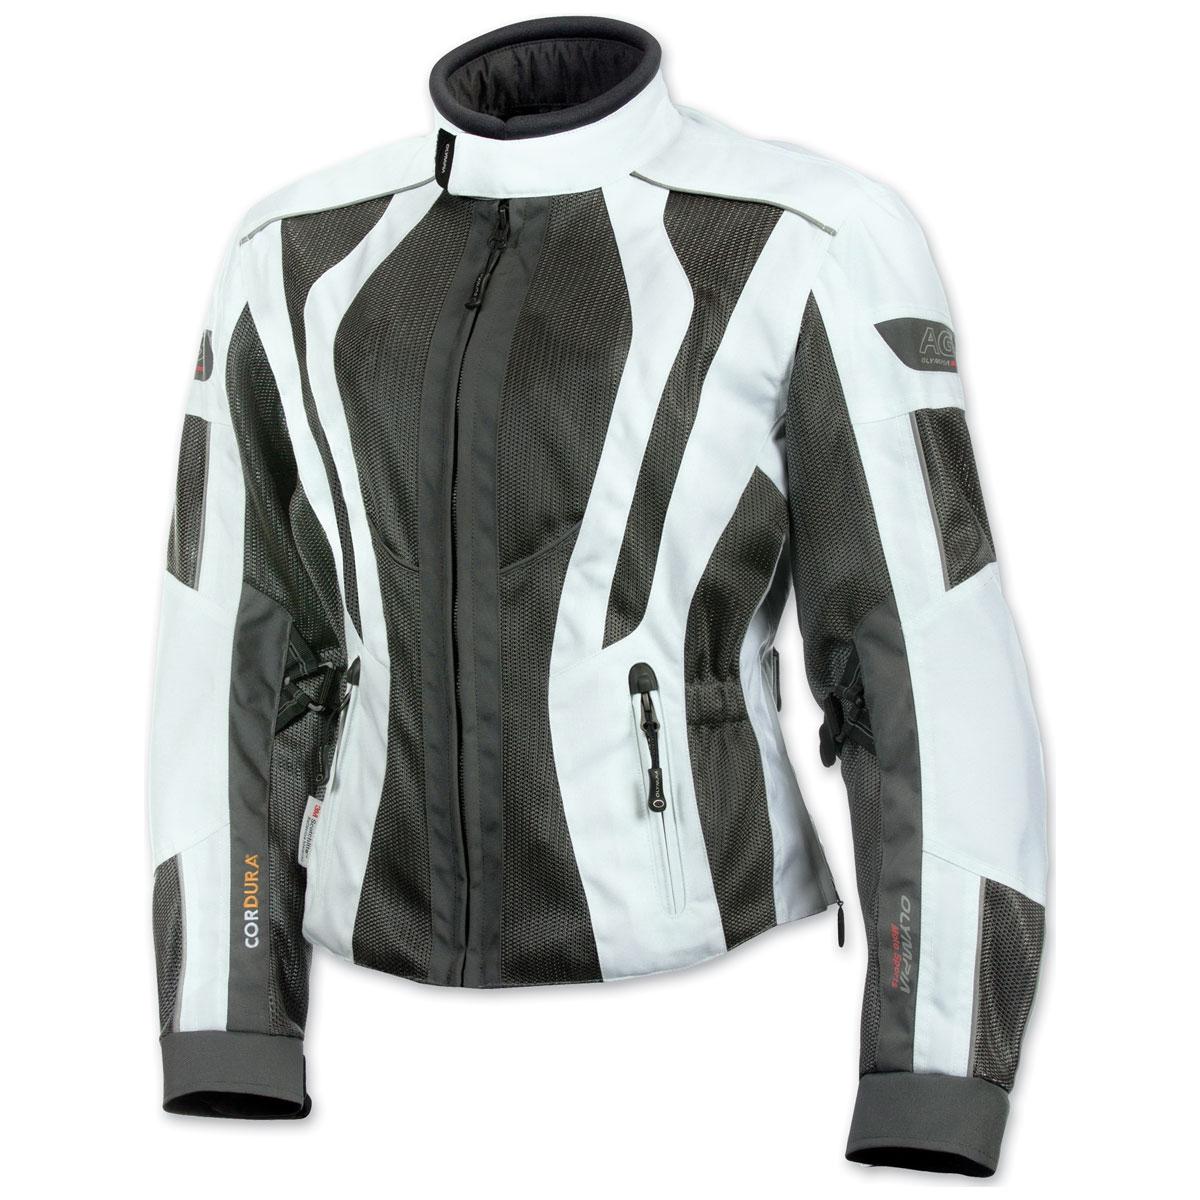 Olympia Moto Sports Women's Airglide 5 Mesh Tech Ivory Jacket